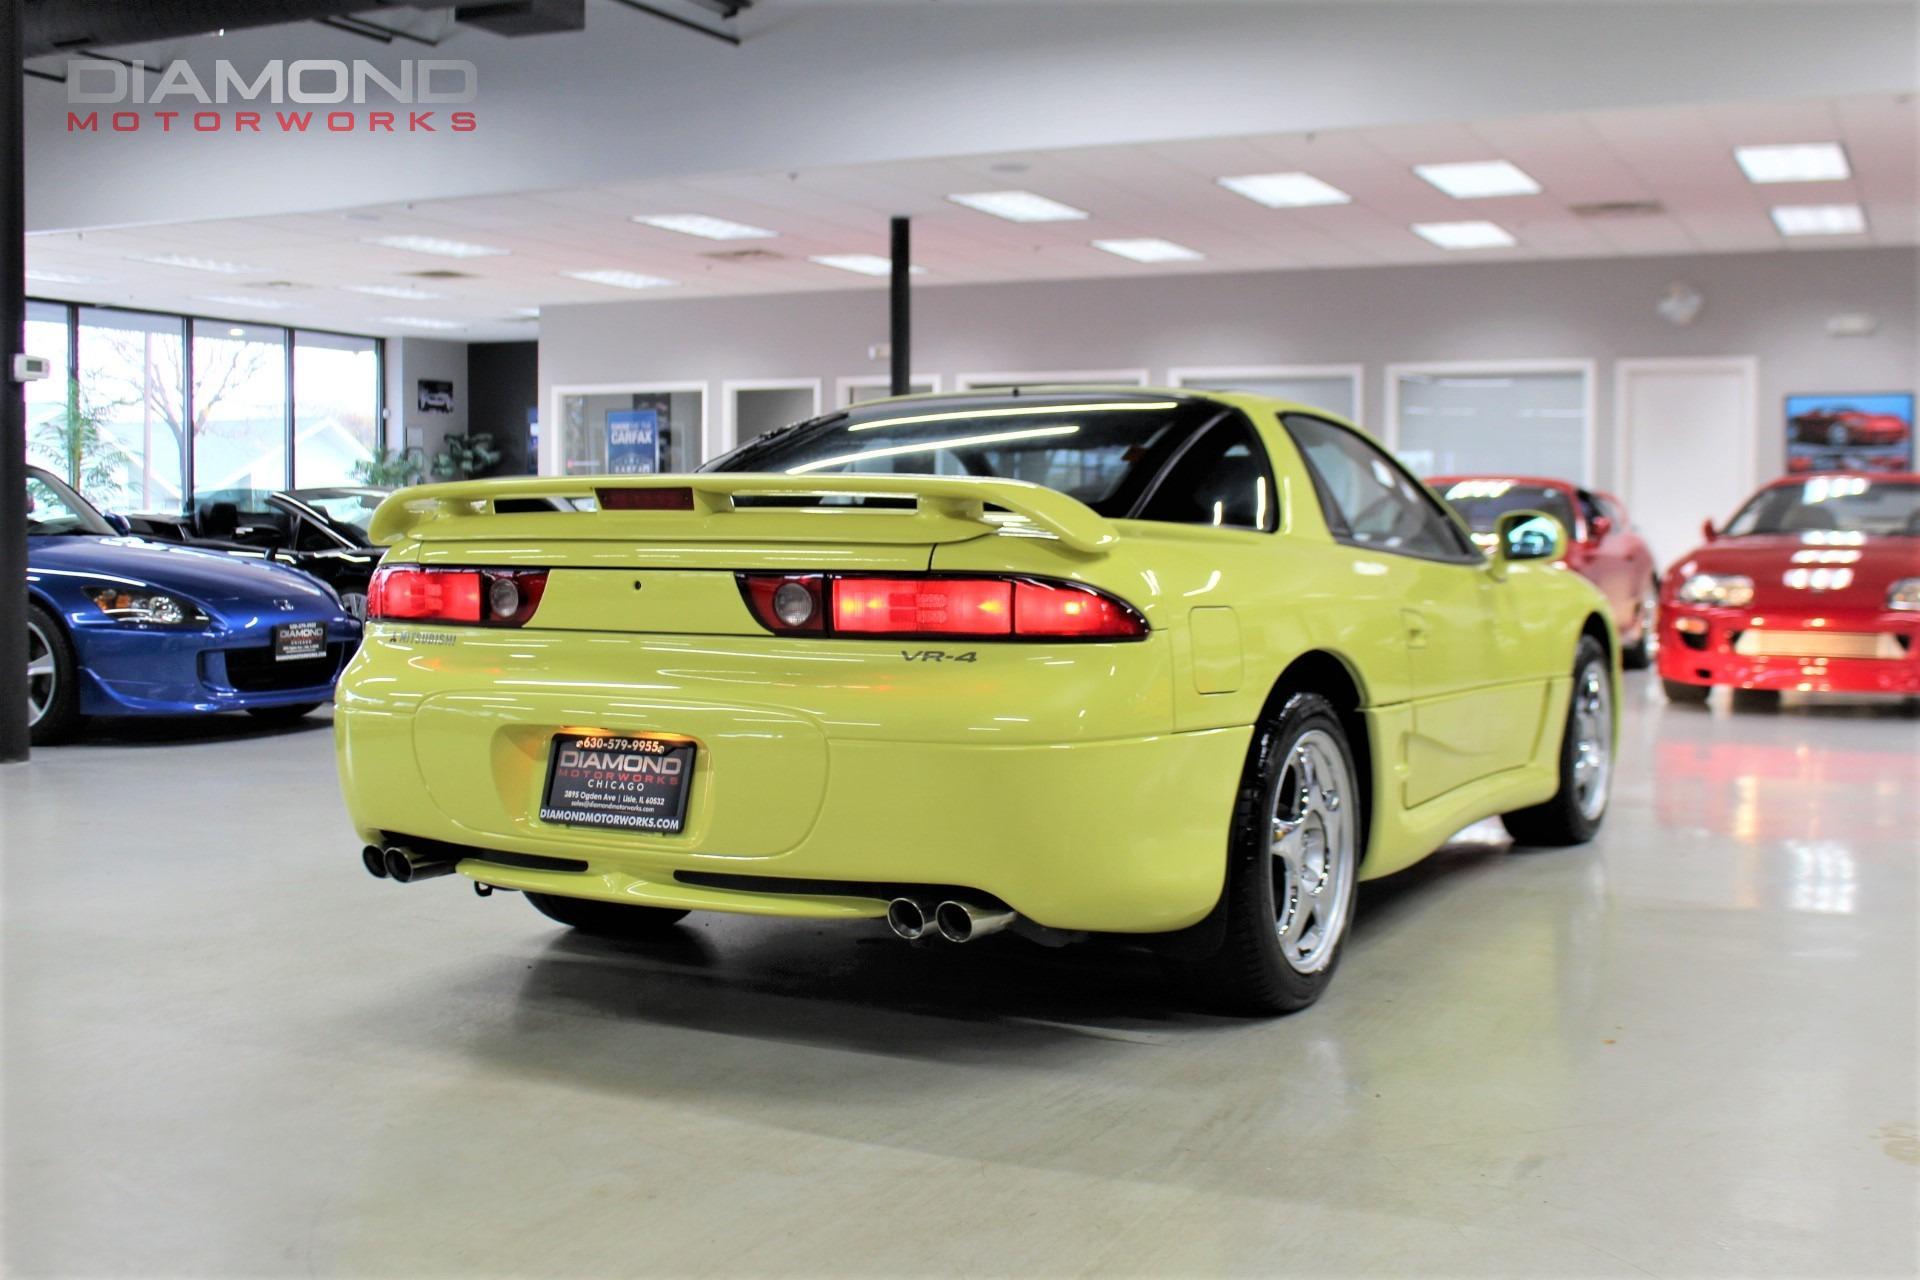 Used-1994-Mitsubishi-3000GT-VR-4-Turbo